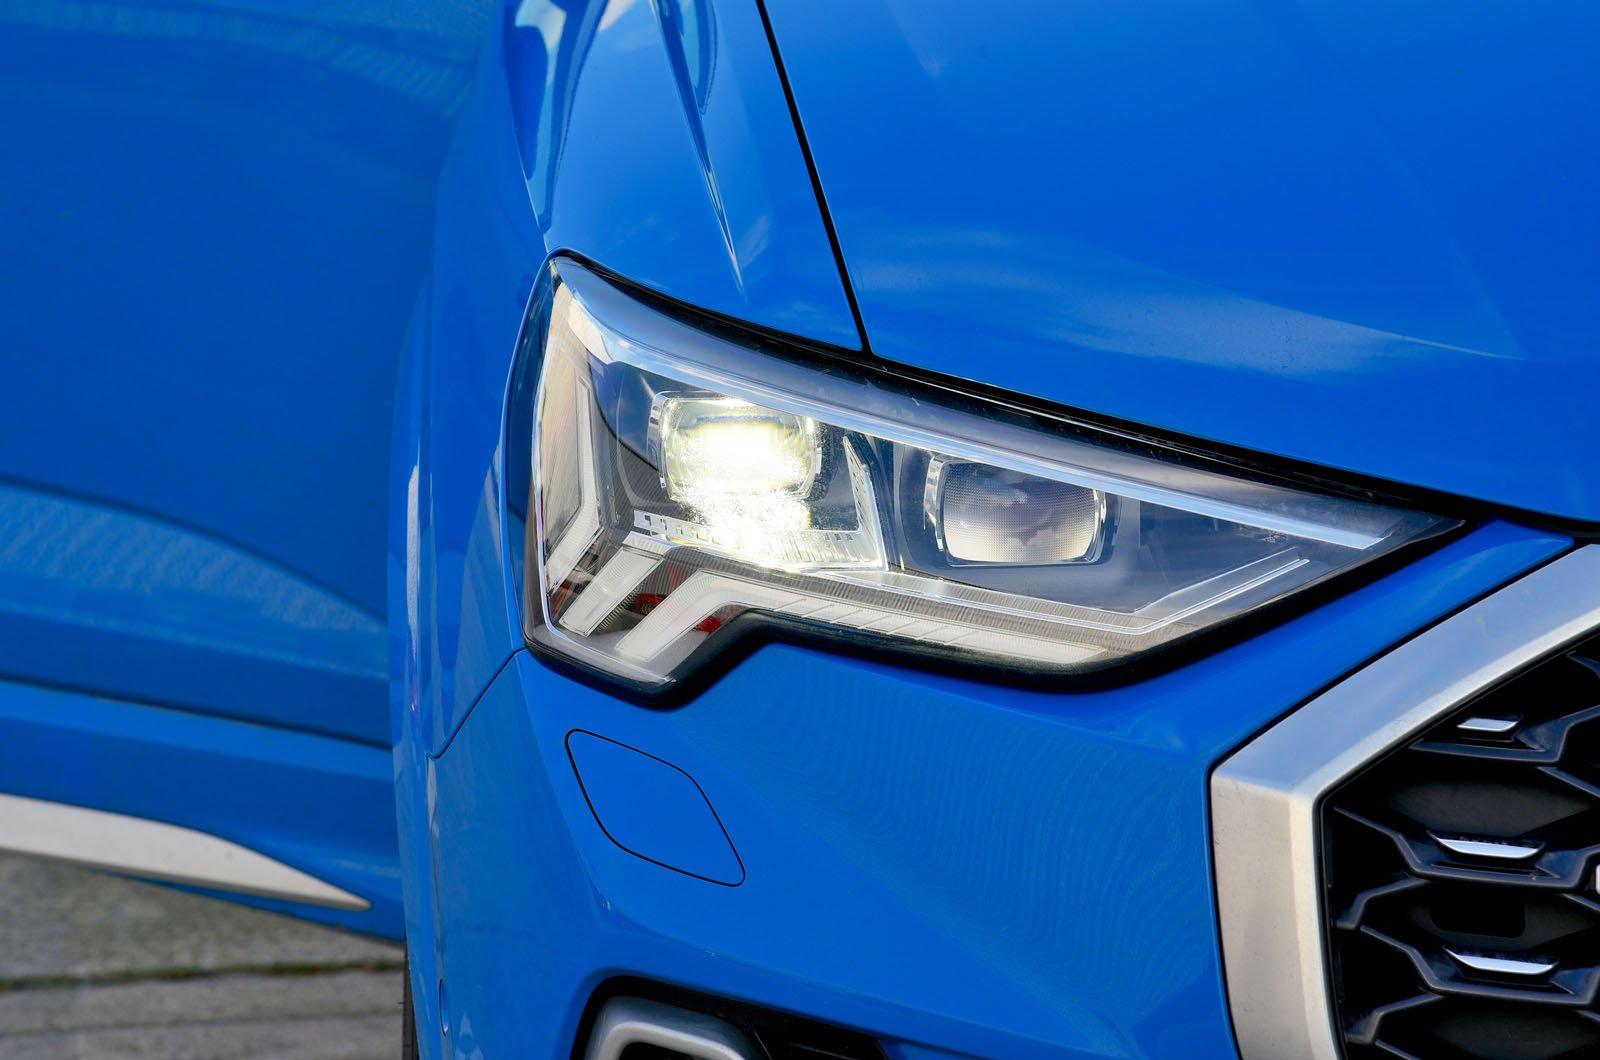 LT Audi Q3 Sportback Matrix LED headlight